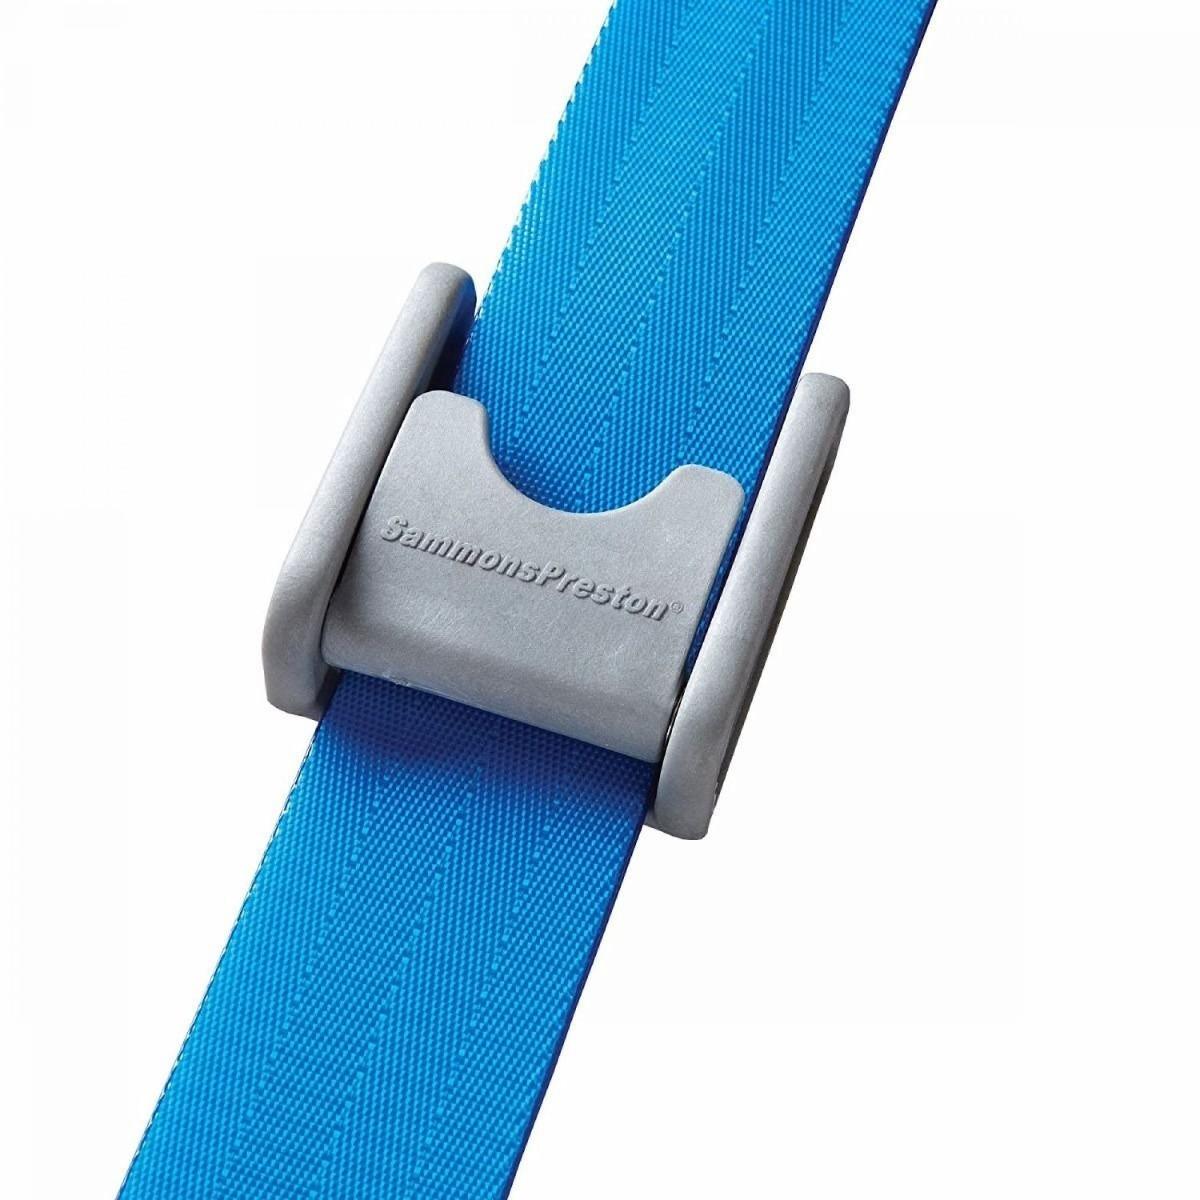 "Sammons Preston Quick Clean Gait Belts, Blue, 72""L, Plastic Buckle"